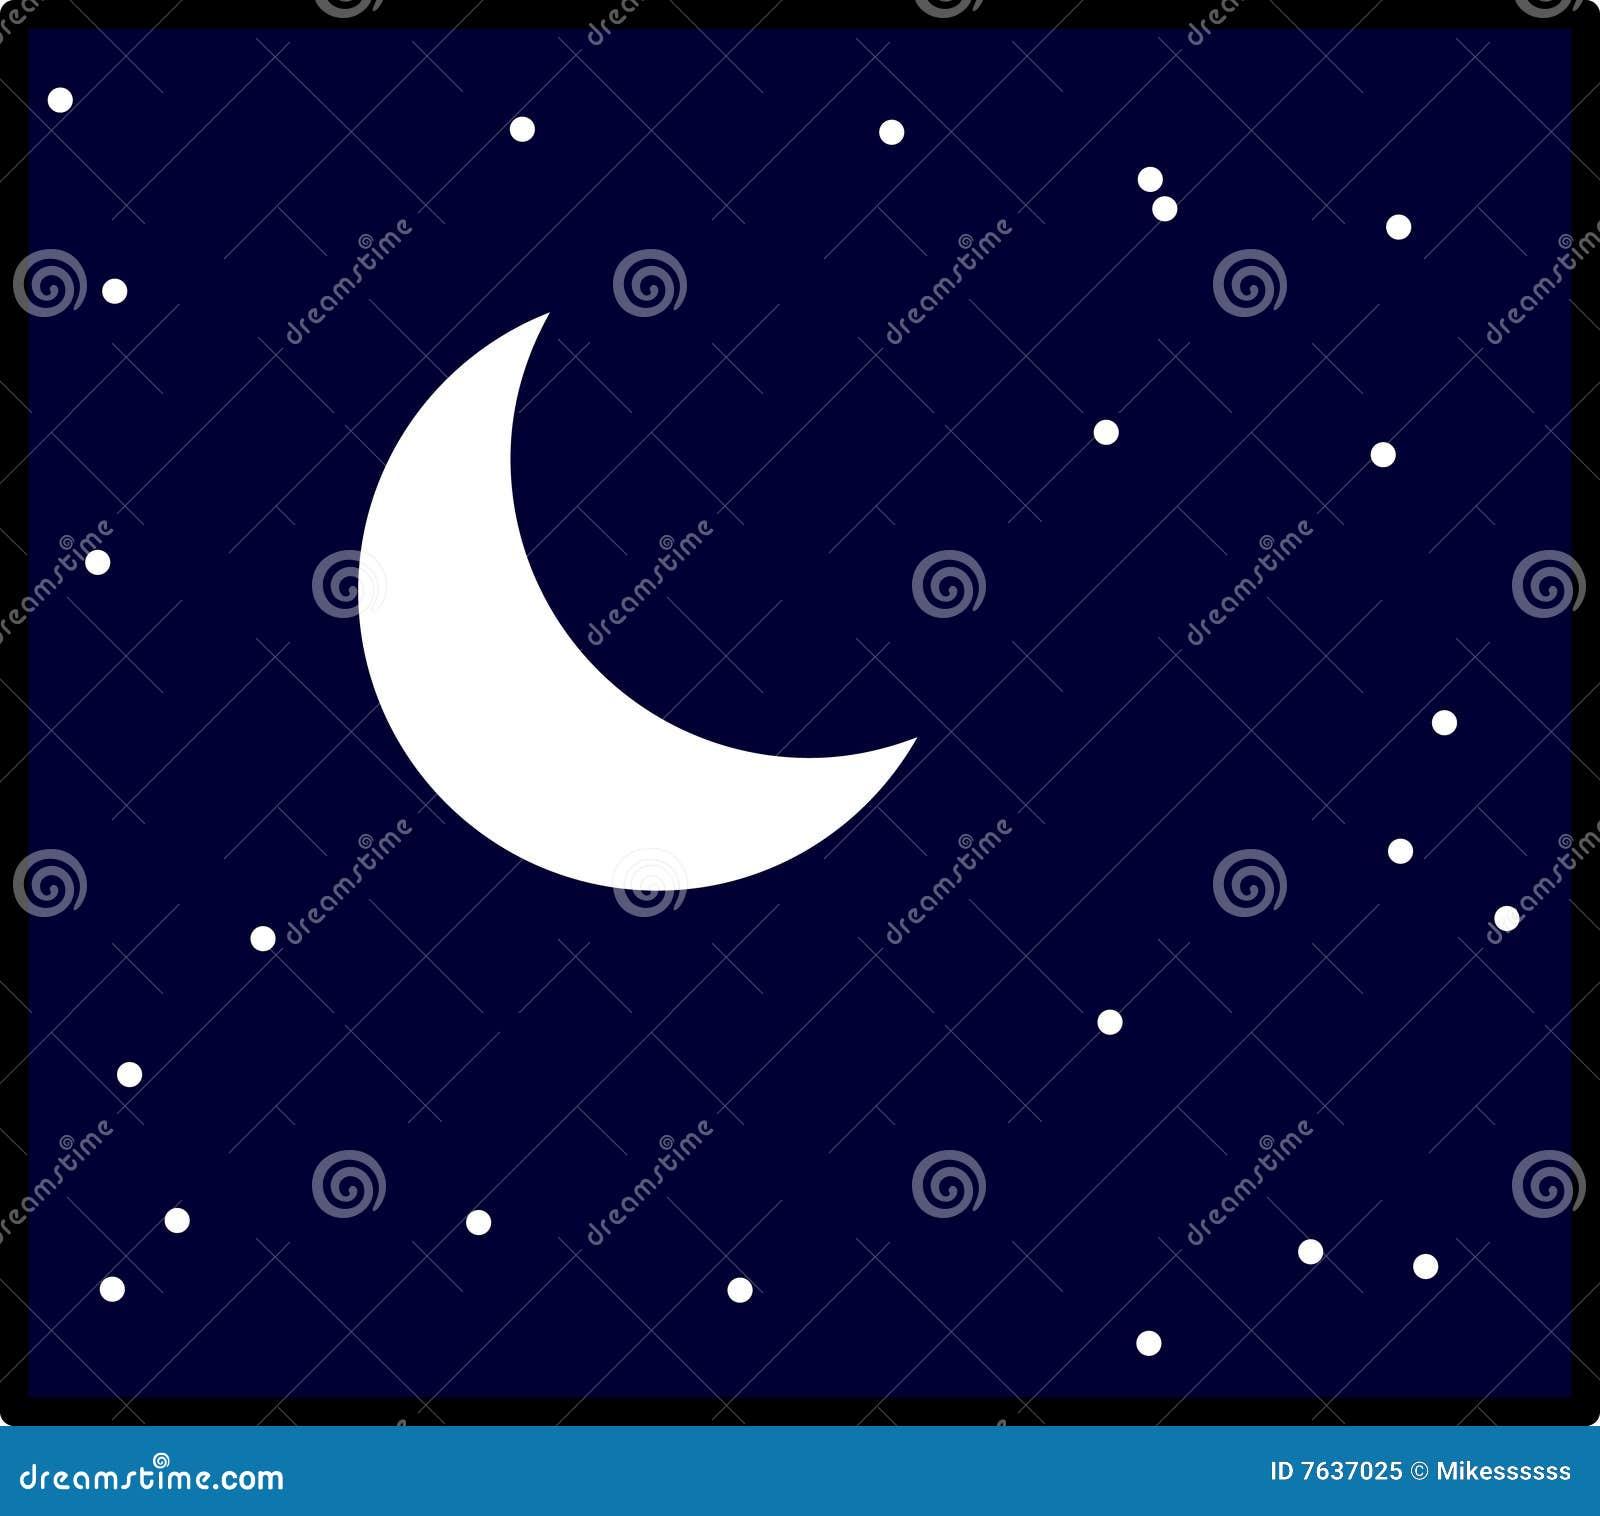 Moon In Night Sky With Stars Vector Illustration Stock ...